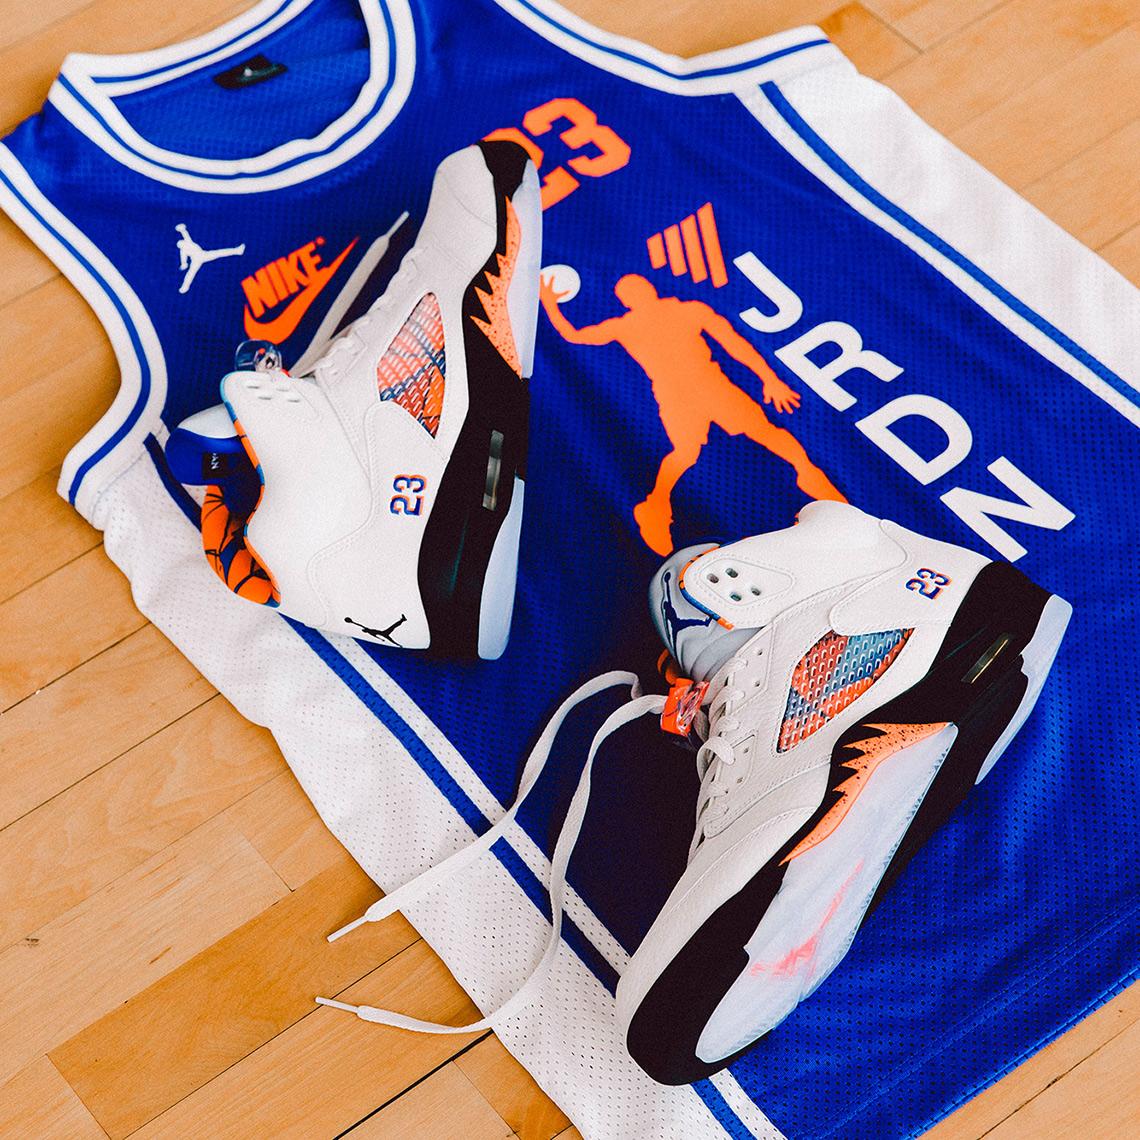 36c5dd91c32 Air Jordan 5 Retro Release Date: August 28th, 2018 $190. Color: Sail/Orange  Peel-Black-Hyper Royal